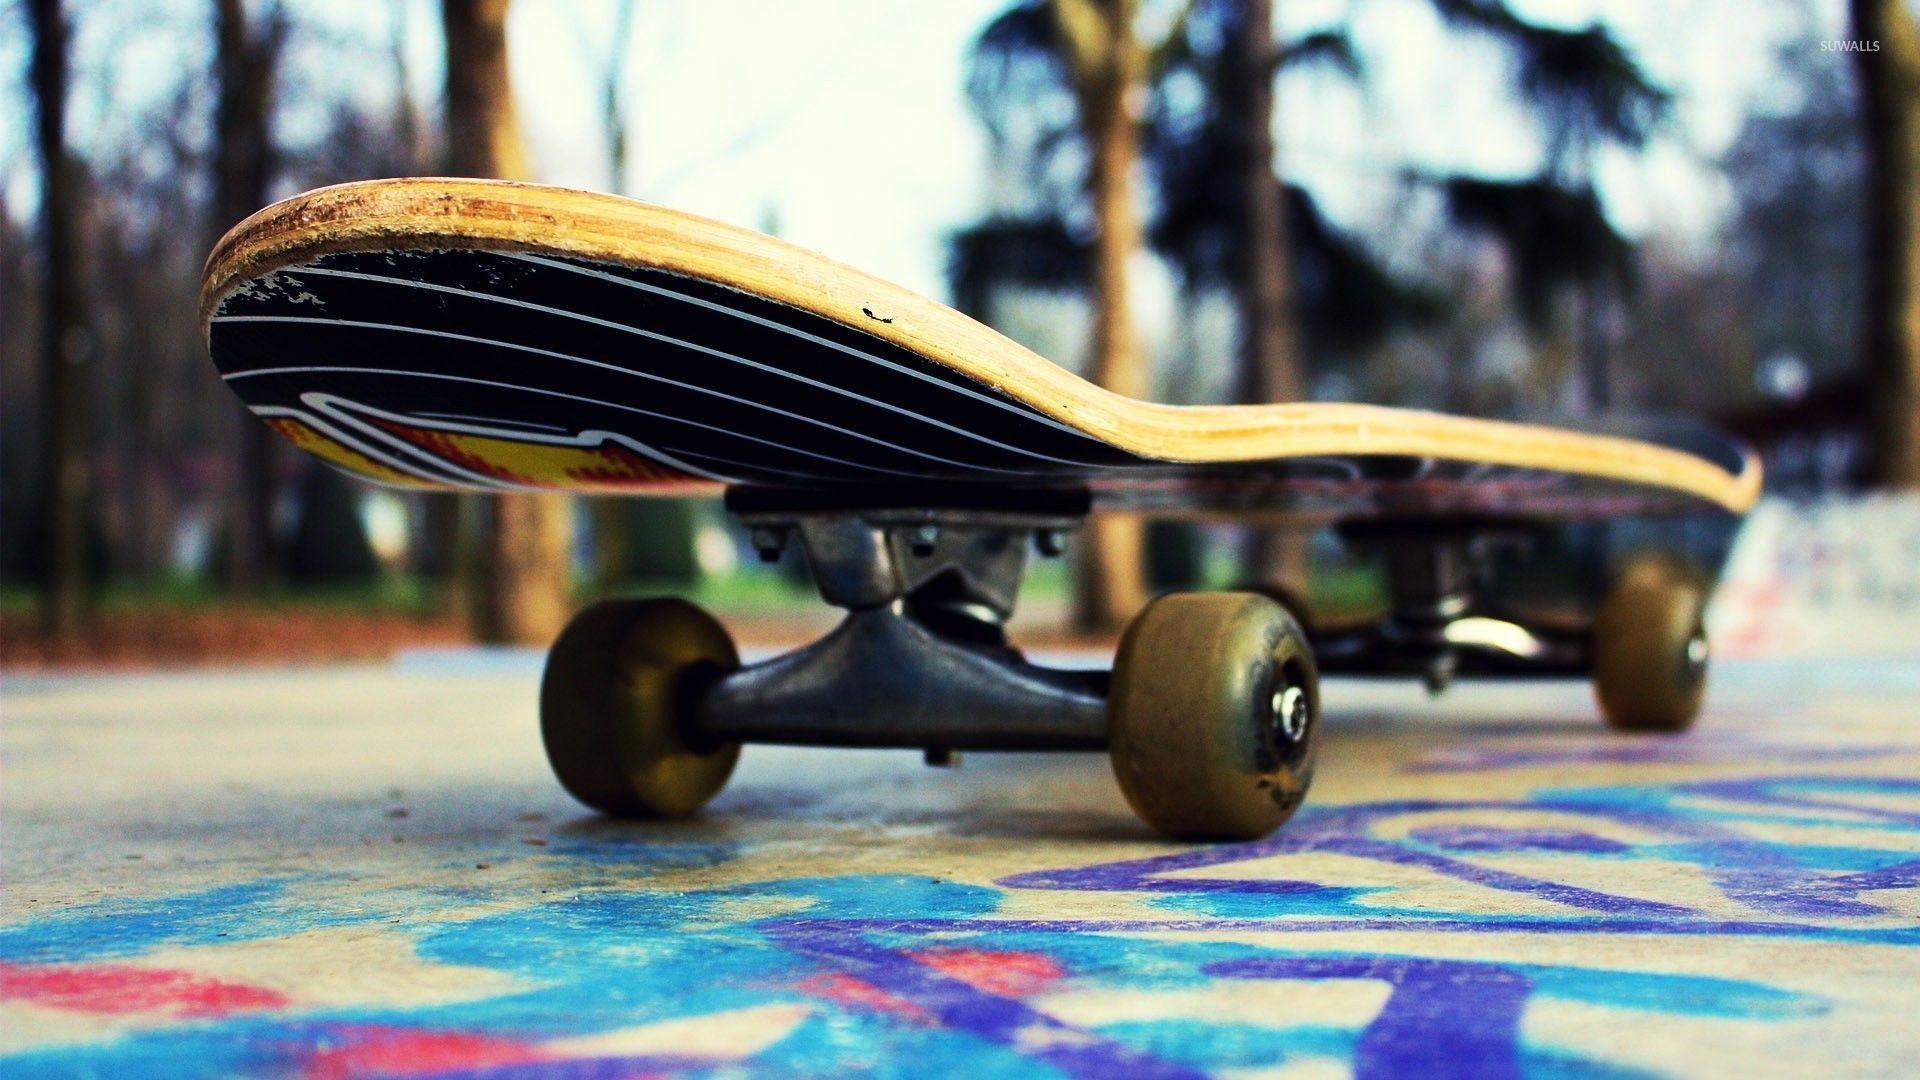 Skate Board Wallpapers ·① WallpaperTag